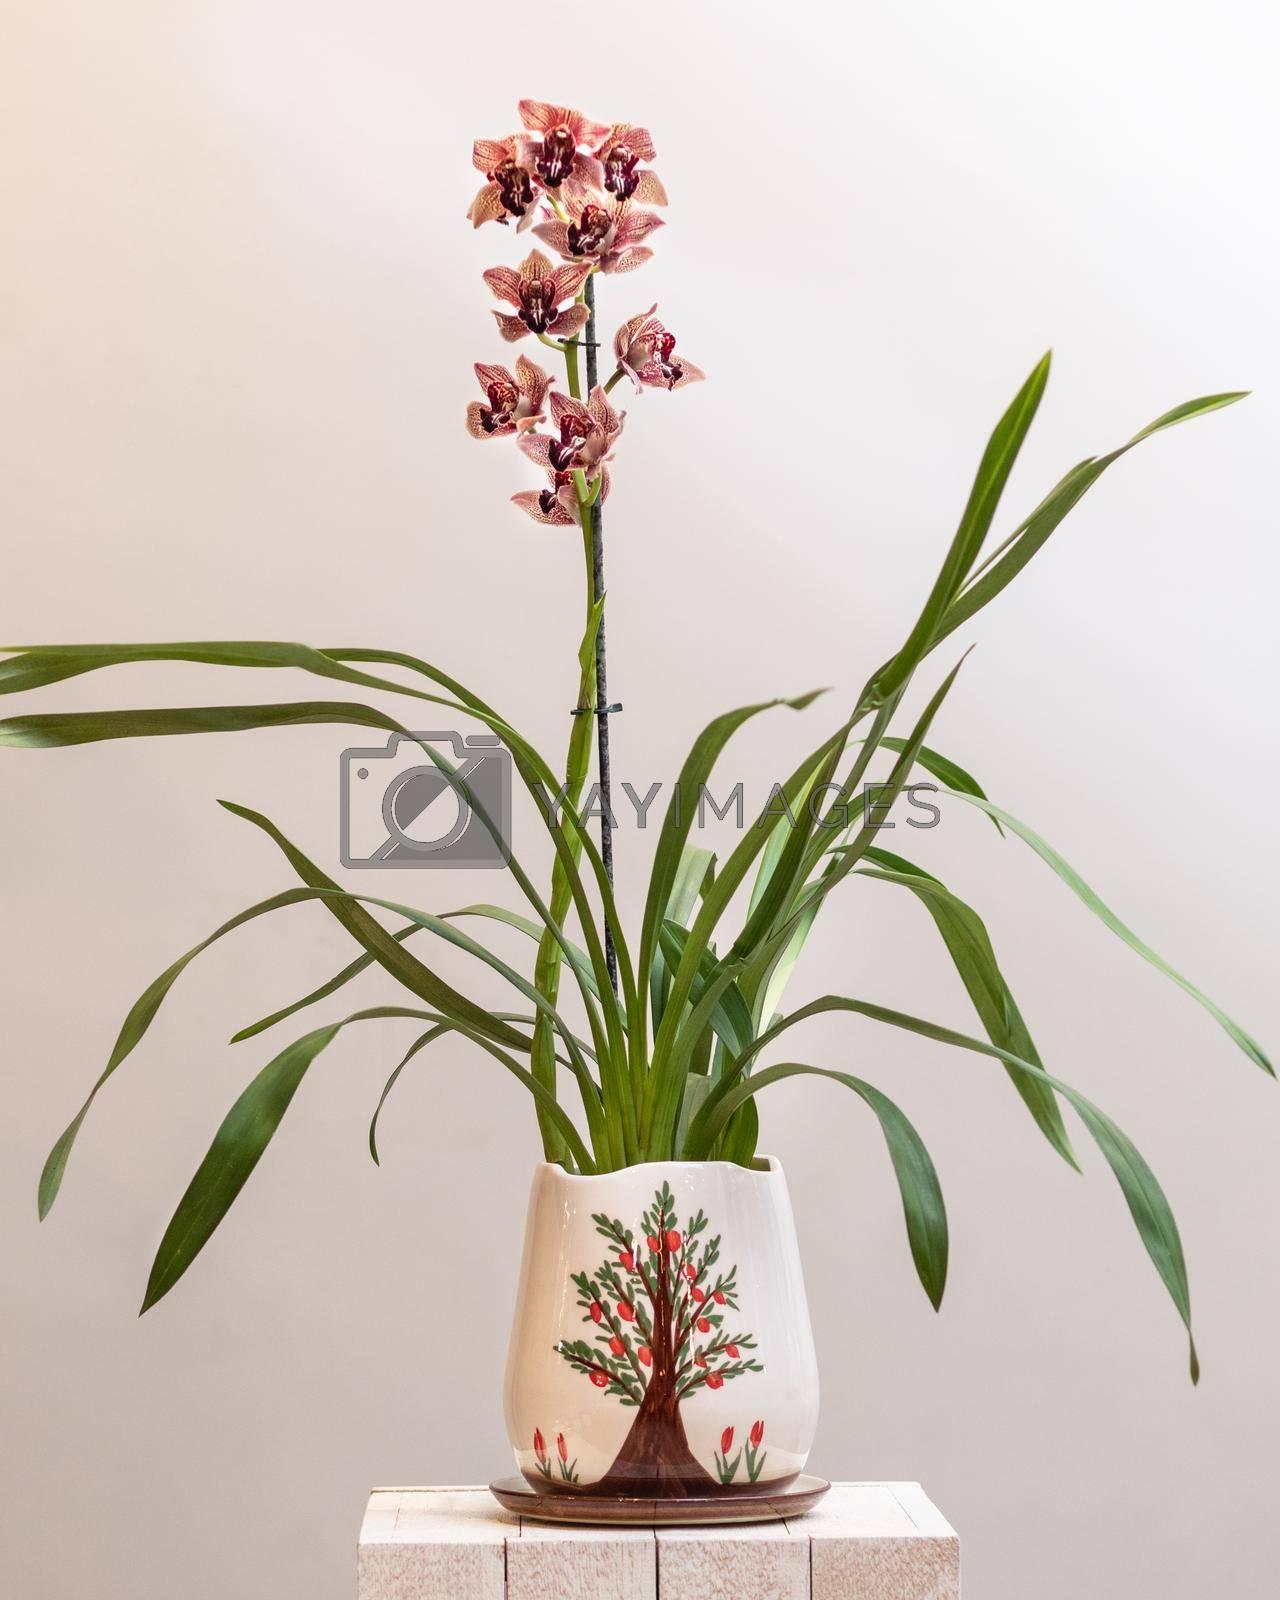 Boat orchid, cymbidium in the pot